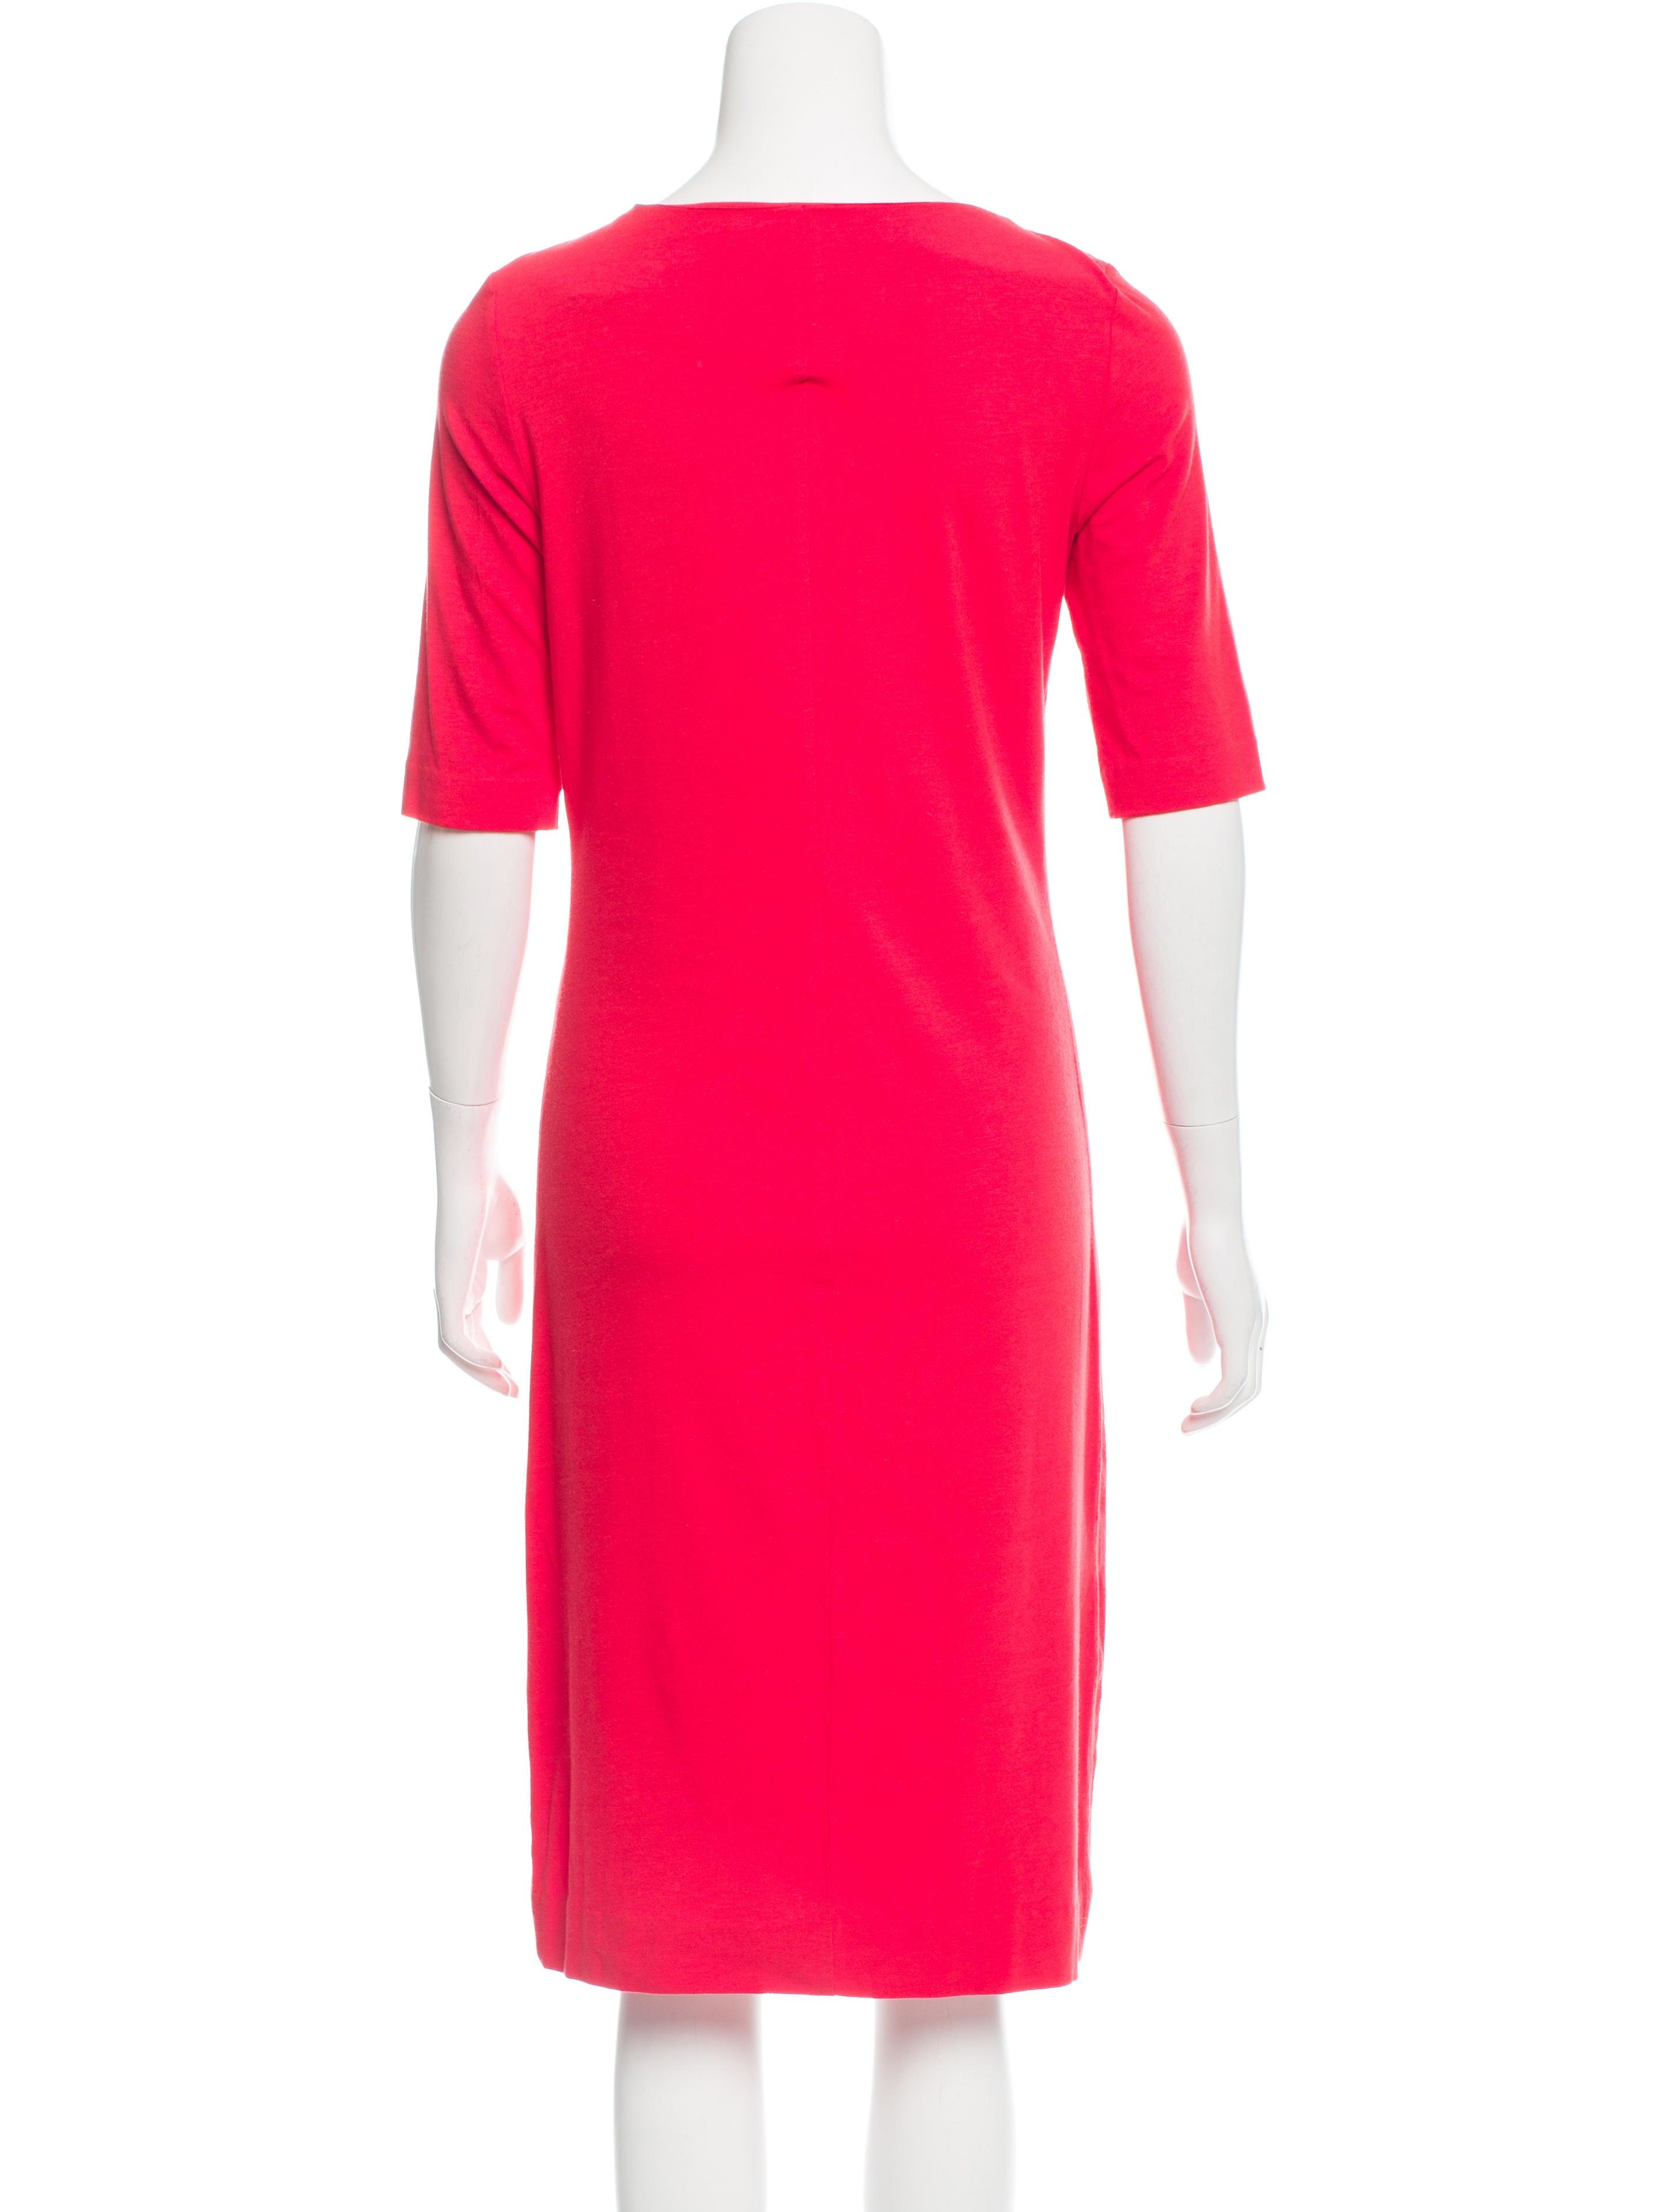 Diane von Furstenberg Short Sleeve Bodycon Dress  : WDI1015733enlarged from www.therealreal.com size 2880 x 3799 jpeg 361kB